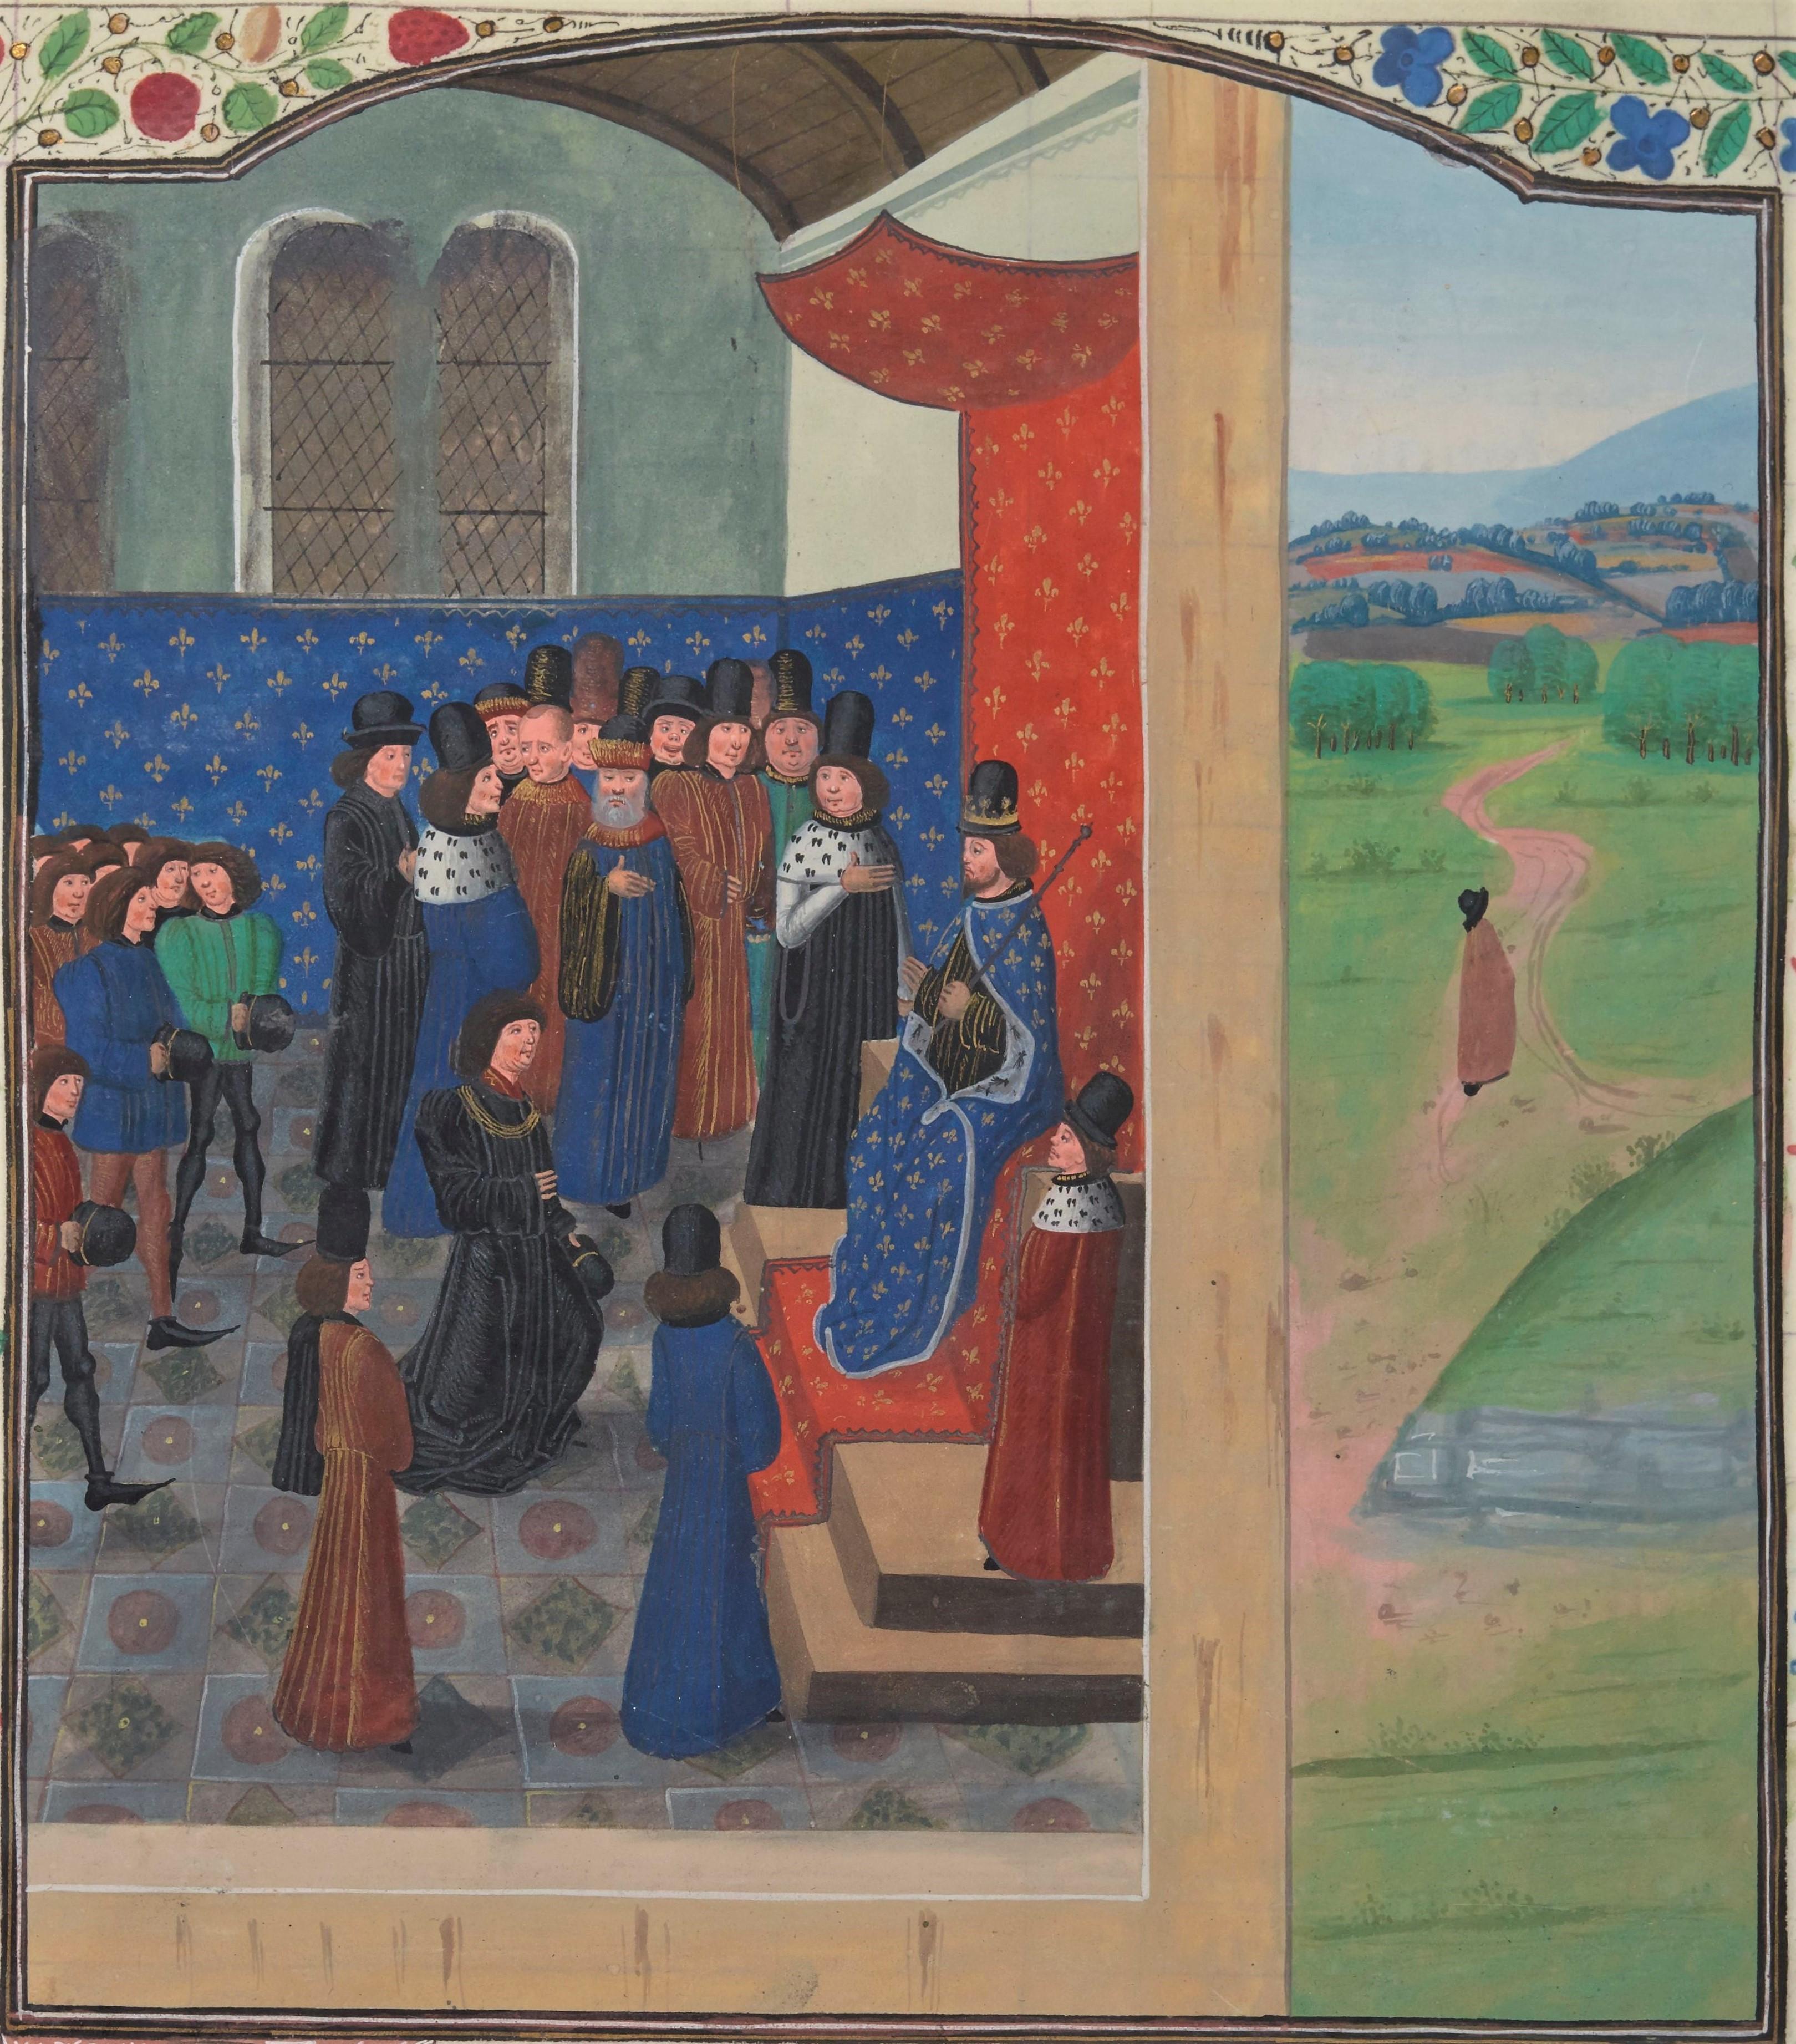 https://upload.wikimedia.org/wikipedia/commons/0/08/Jean_de_Montfort_%281294-1345%29_Philip_VI_of_France.jpg